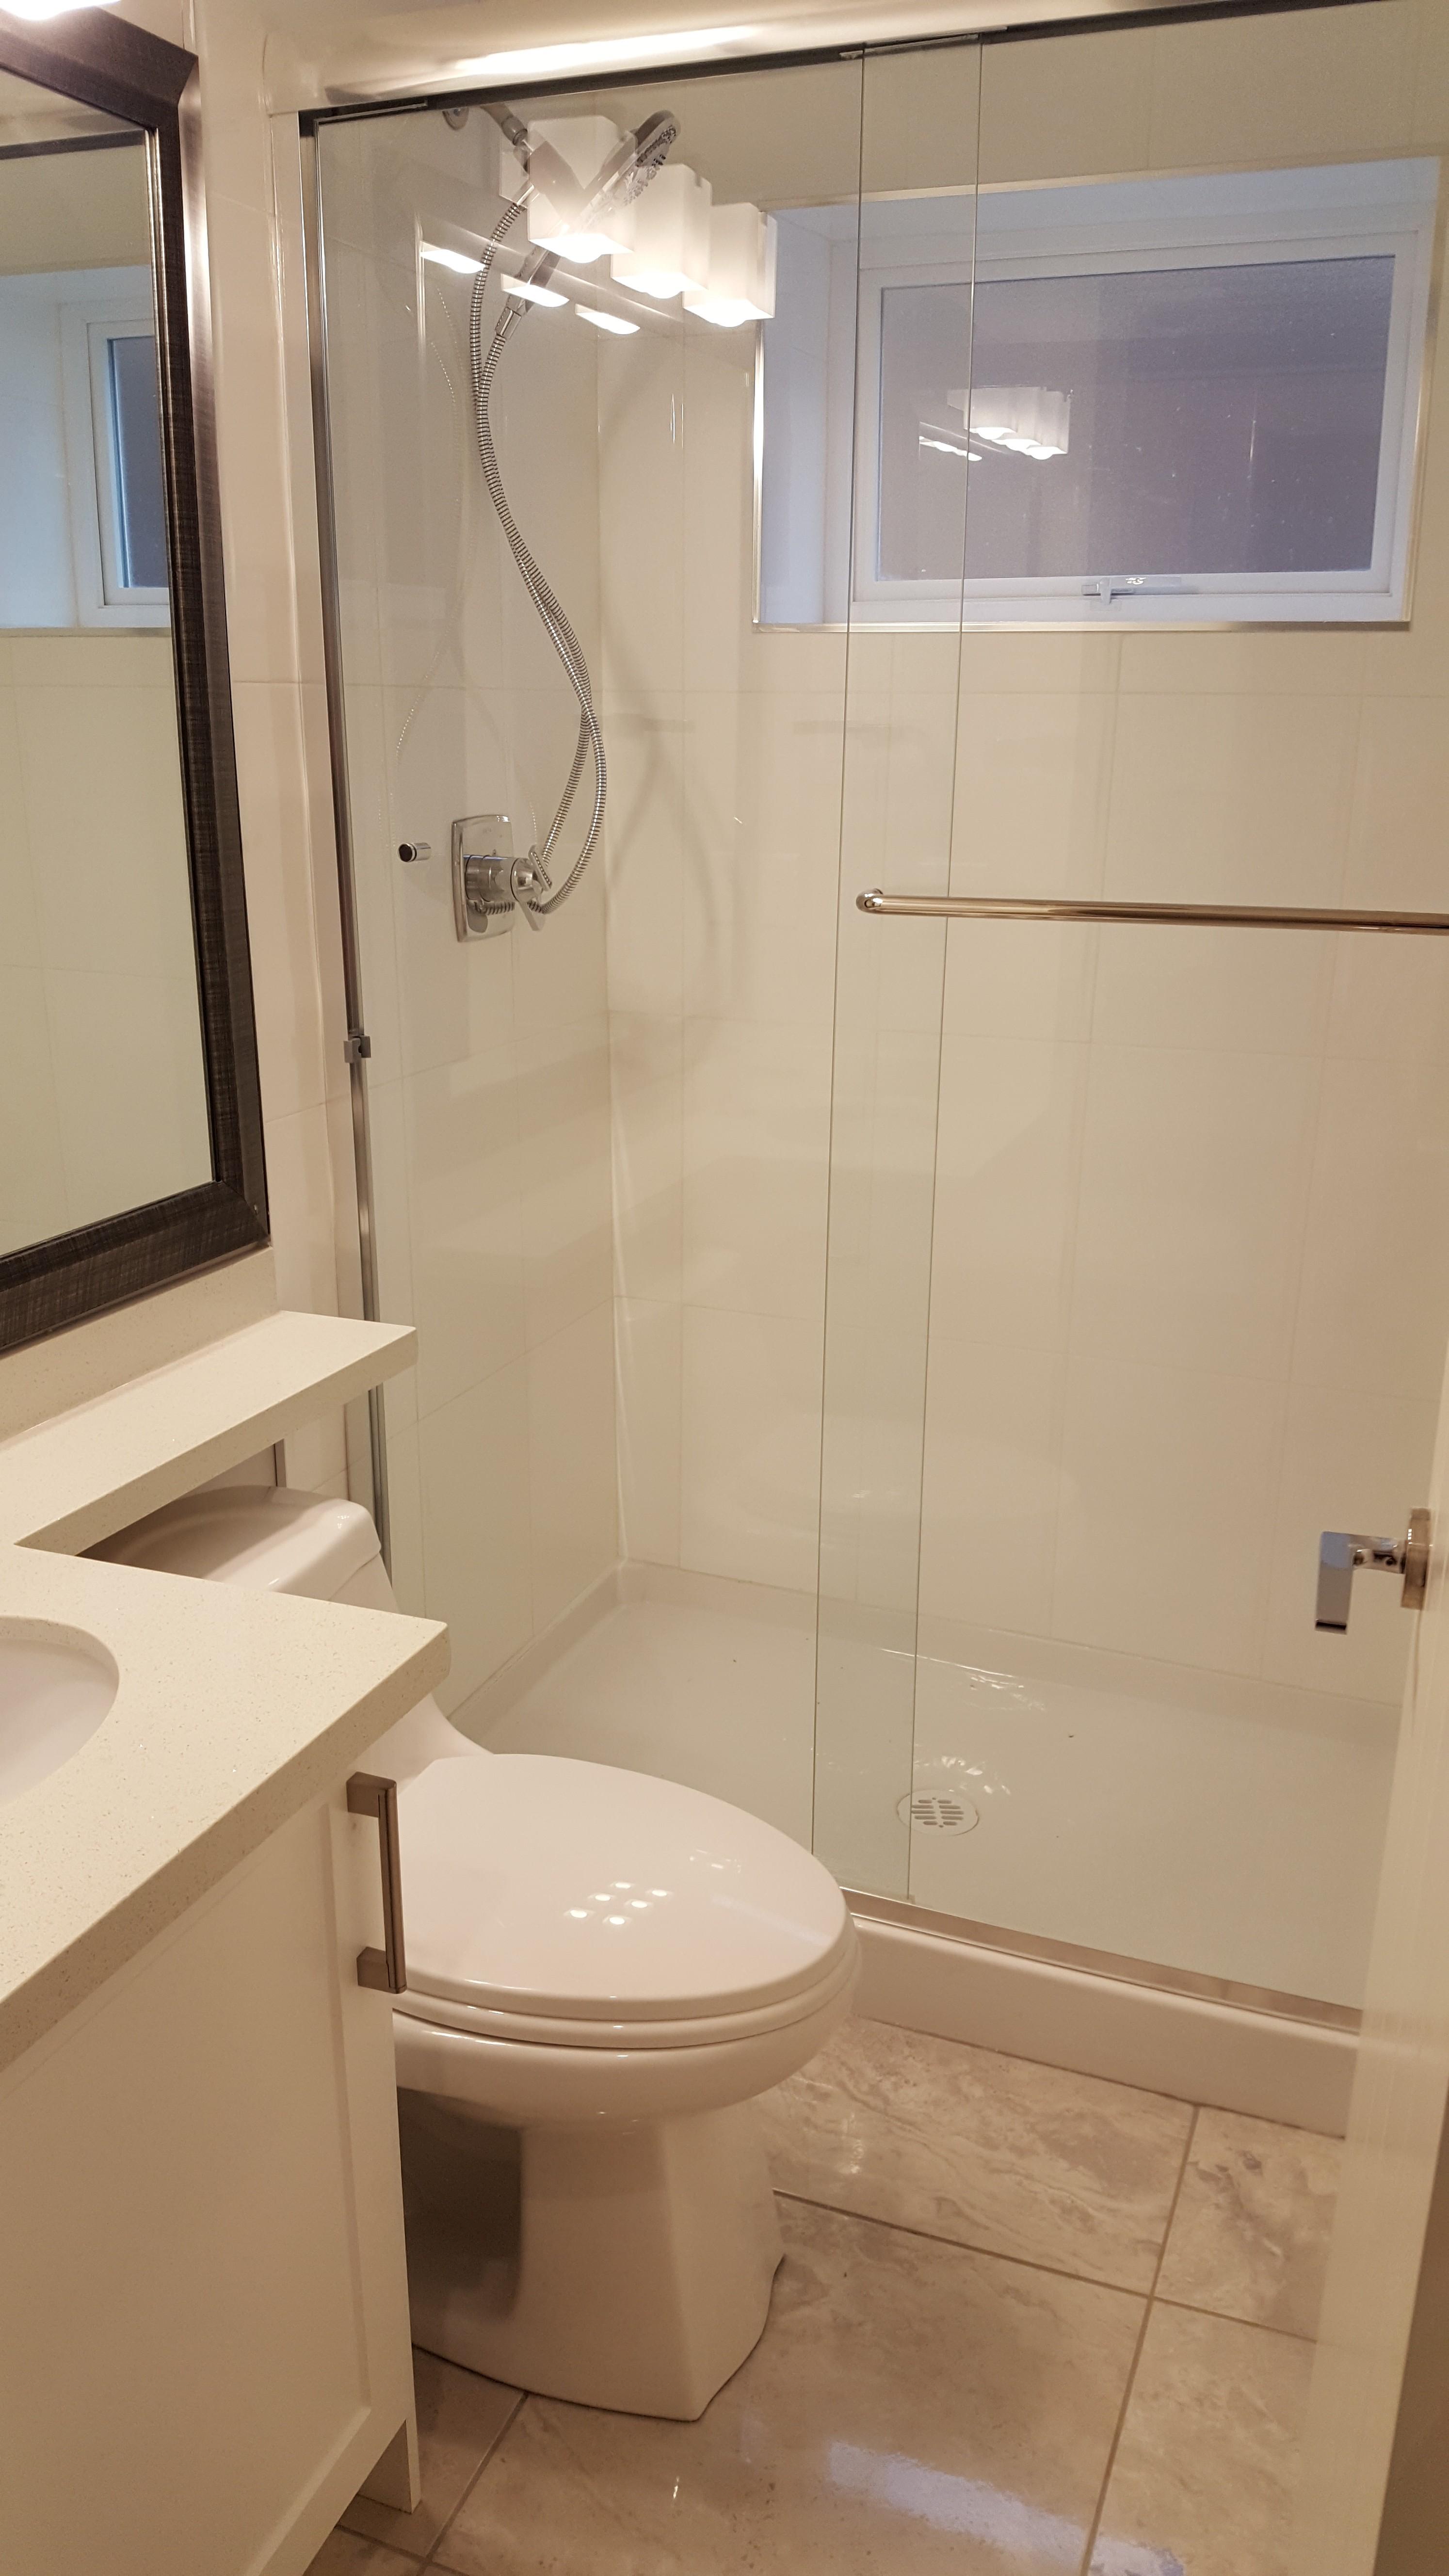 Bathroom Accessories Vancouver Bc 1256 east 41st avenue, vancouver, bc v5w 1r4 - apartment rental